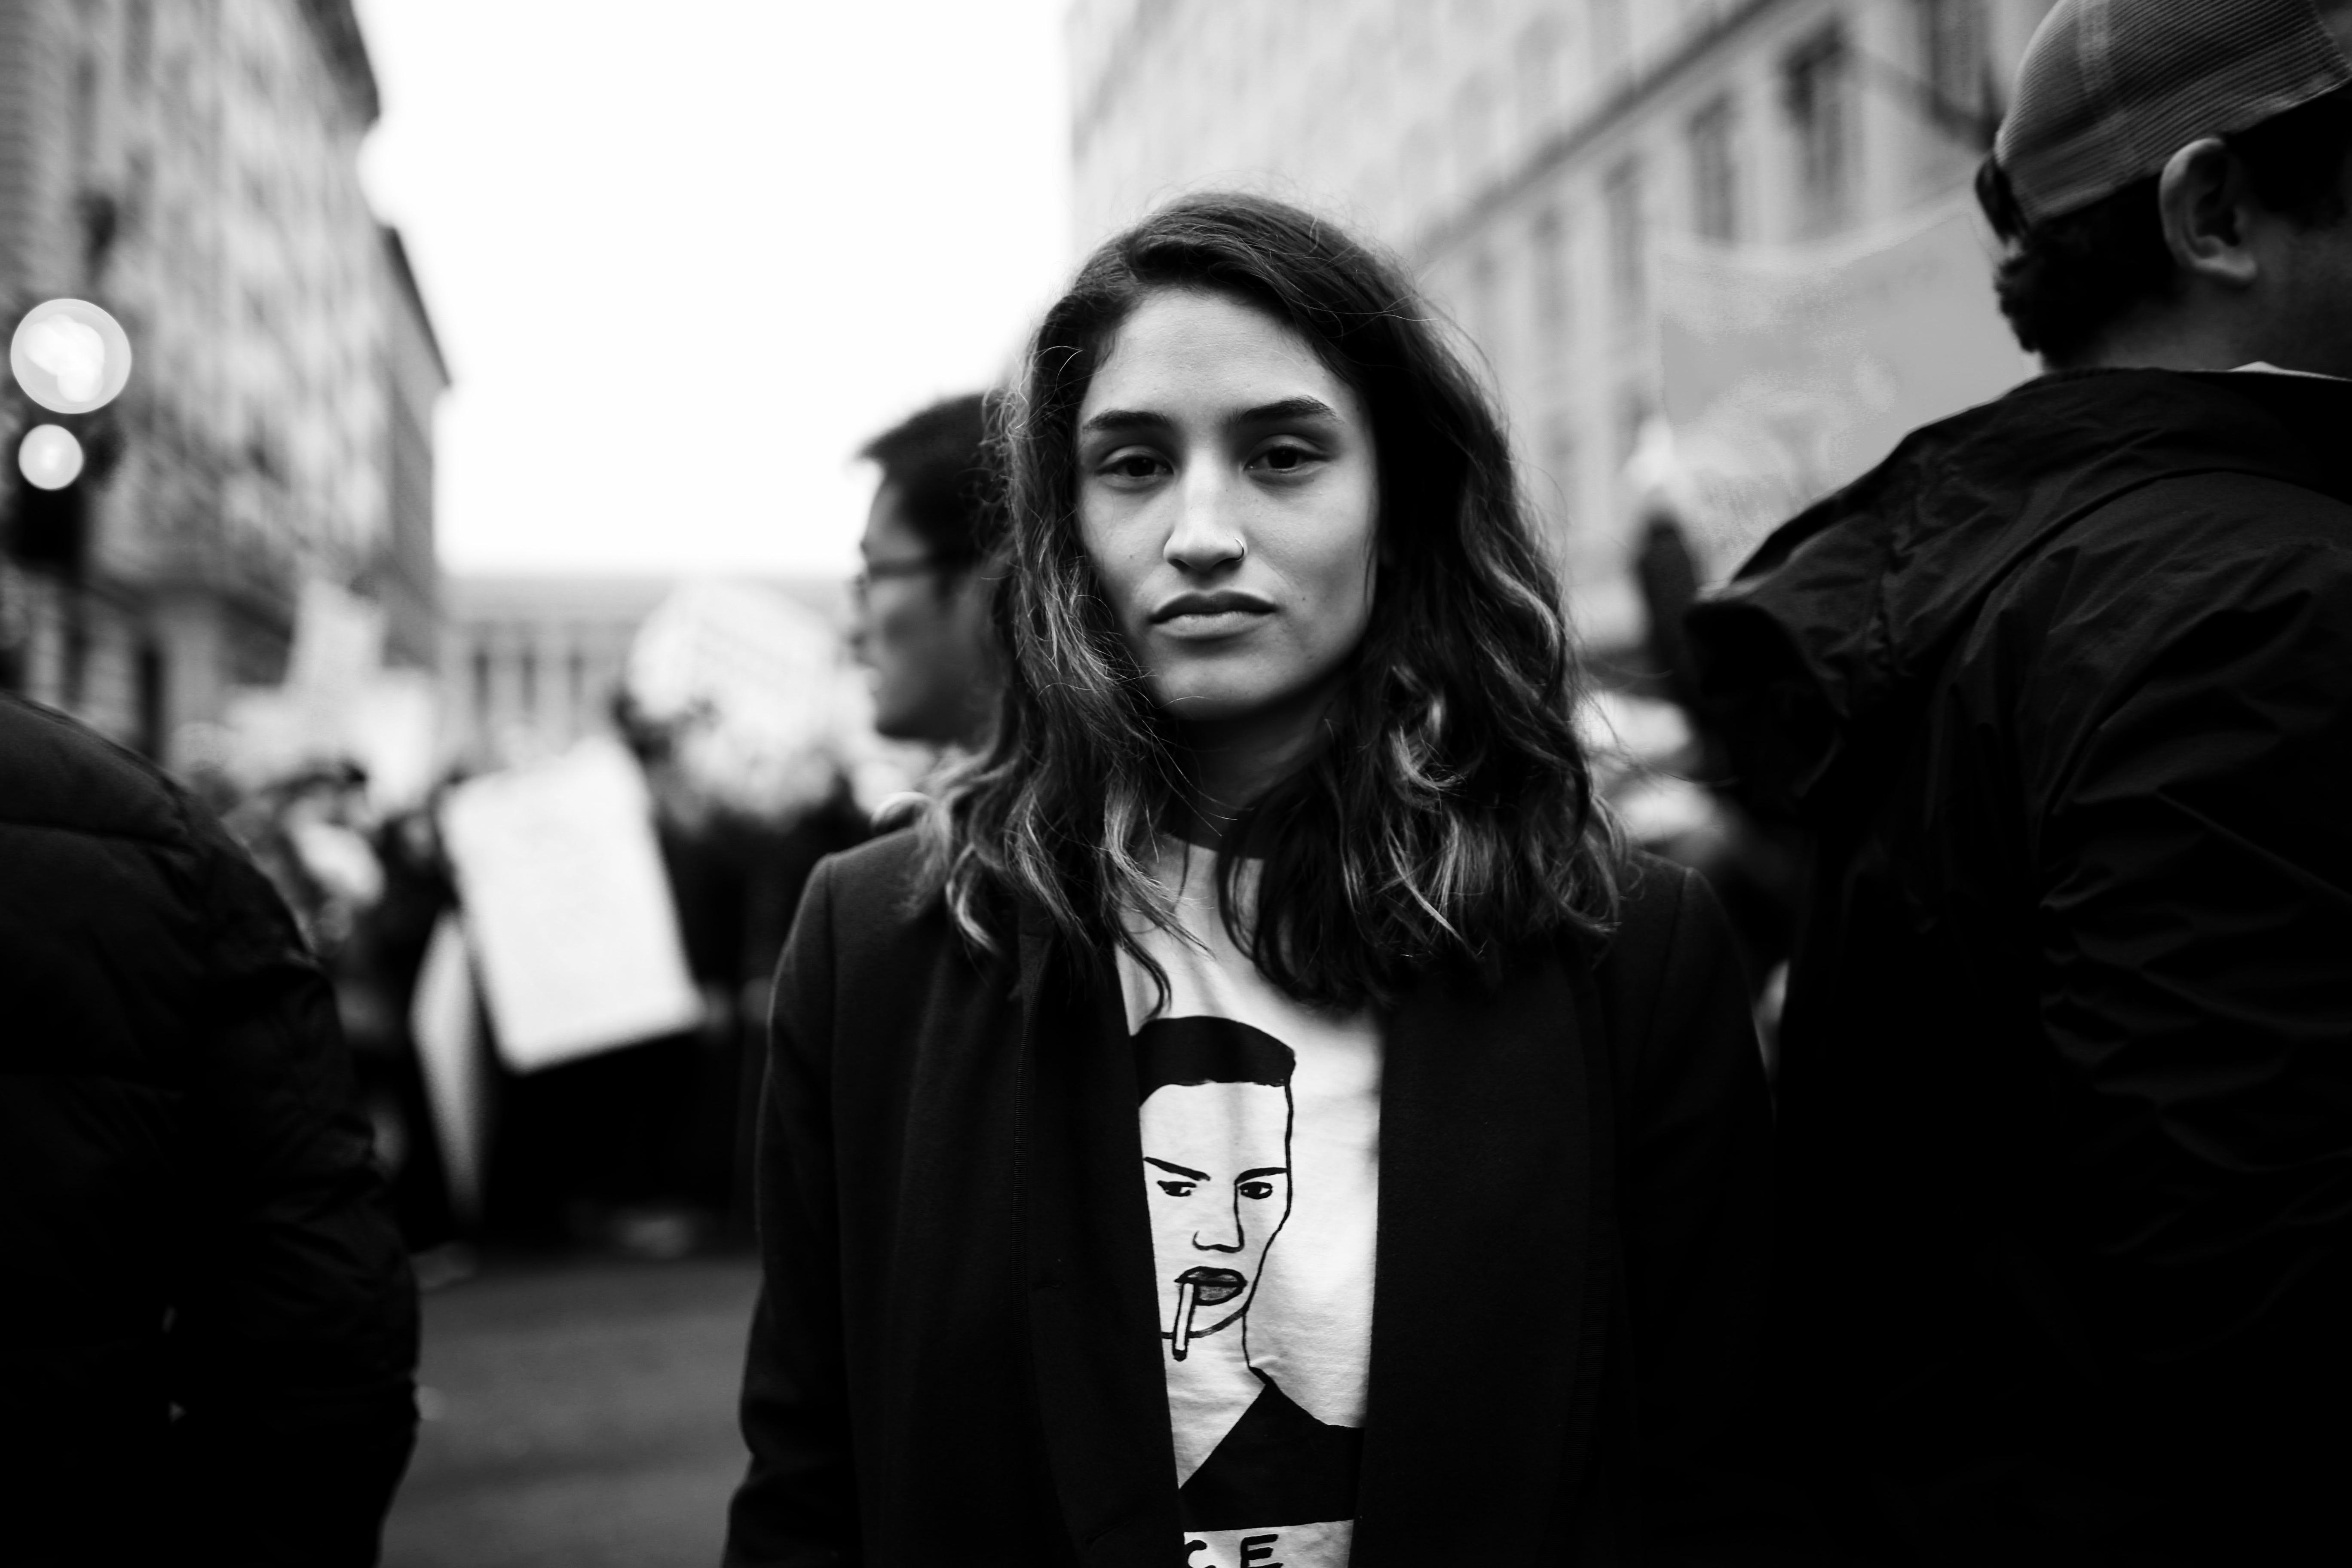 Womens March on Washington: Jessica Galvin